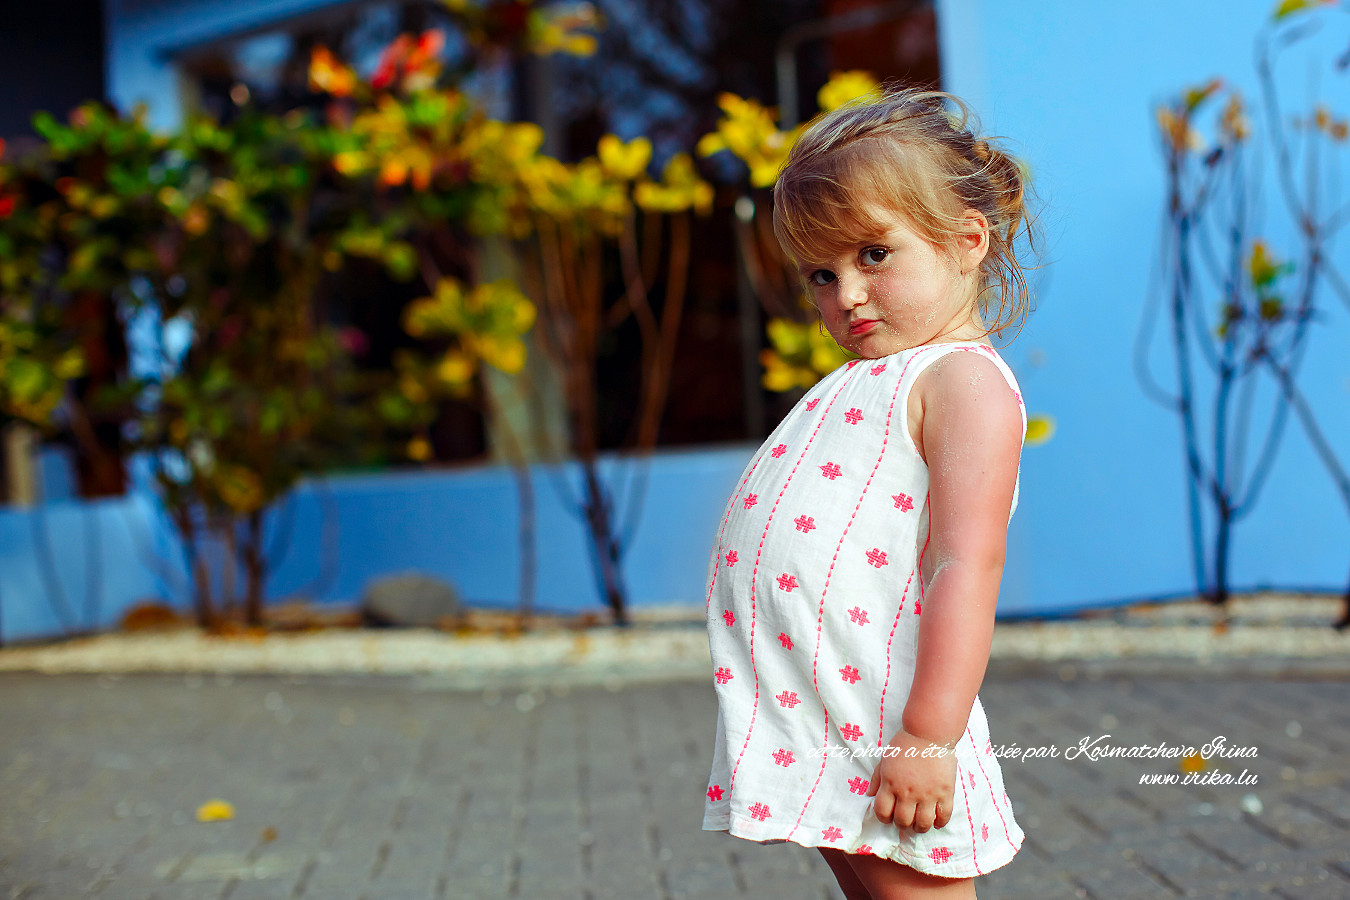 Enfant vexé